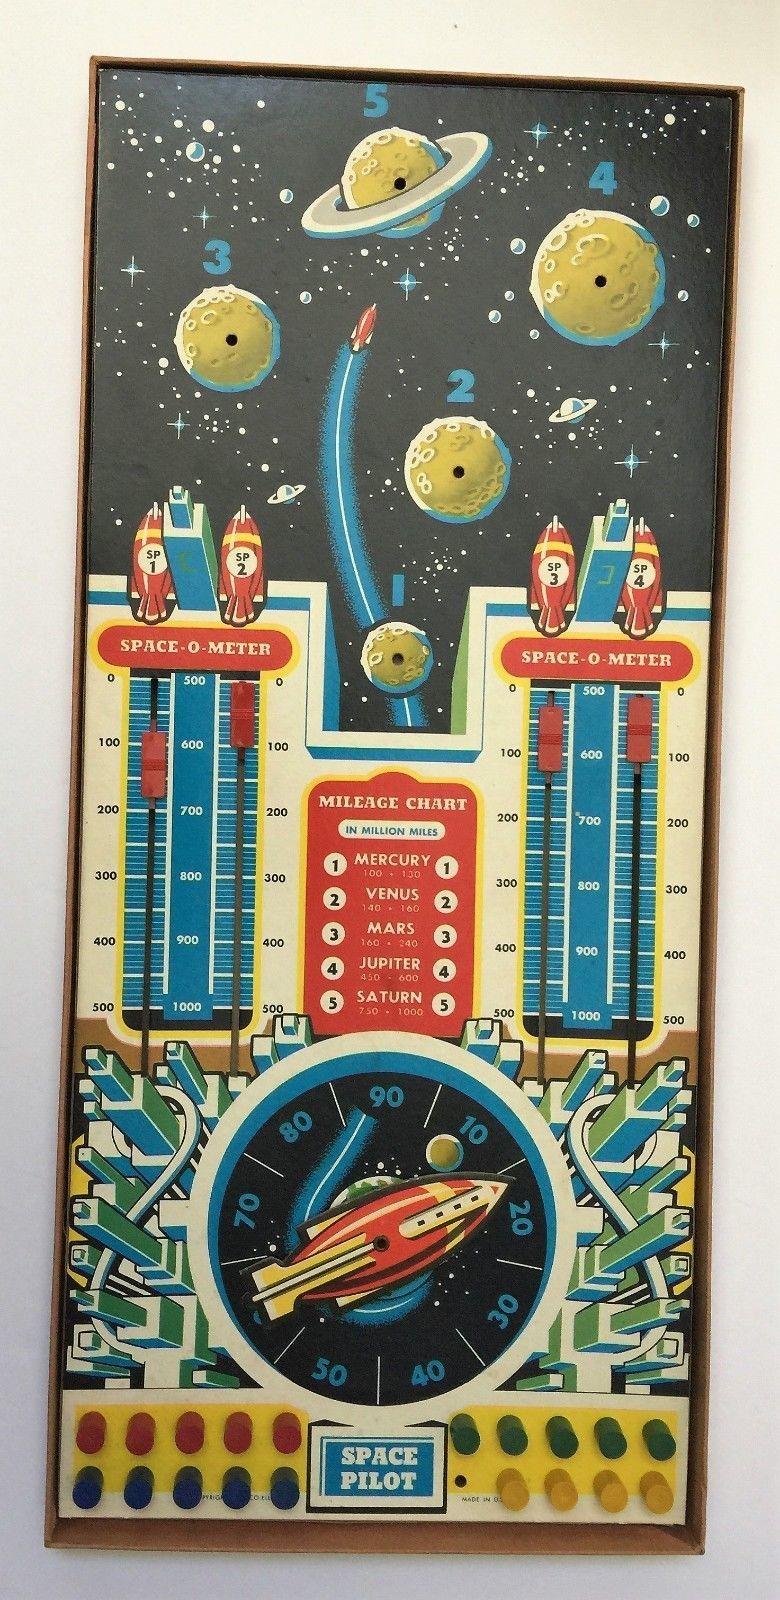 VTG Vintage 1951 Space Pilot by Cadaco Ellis Board Game HARD TO FIND HTF image 3